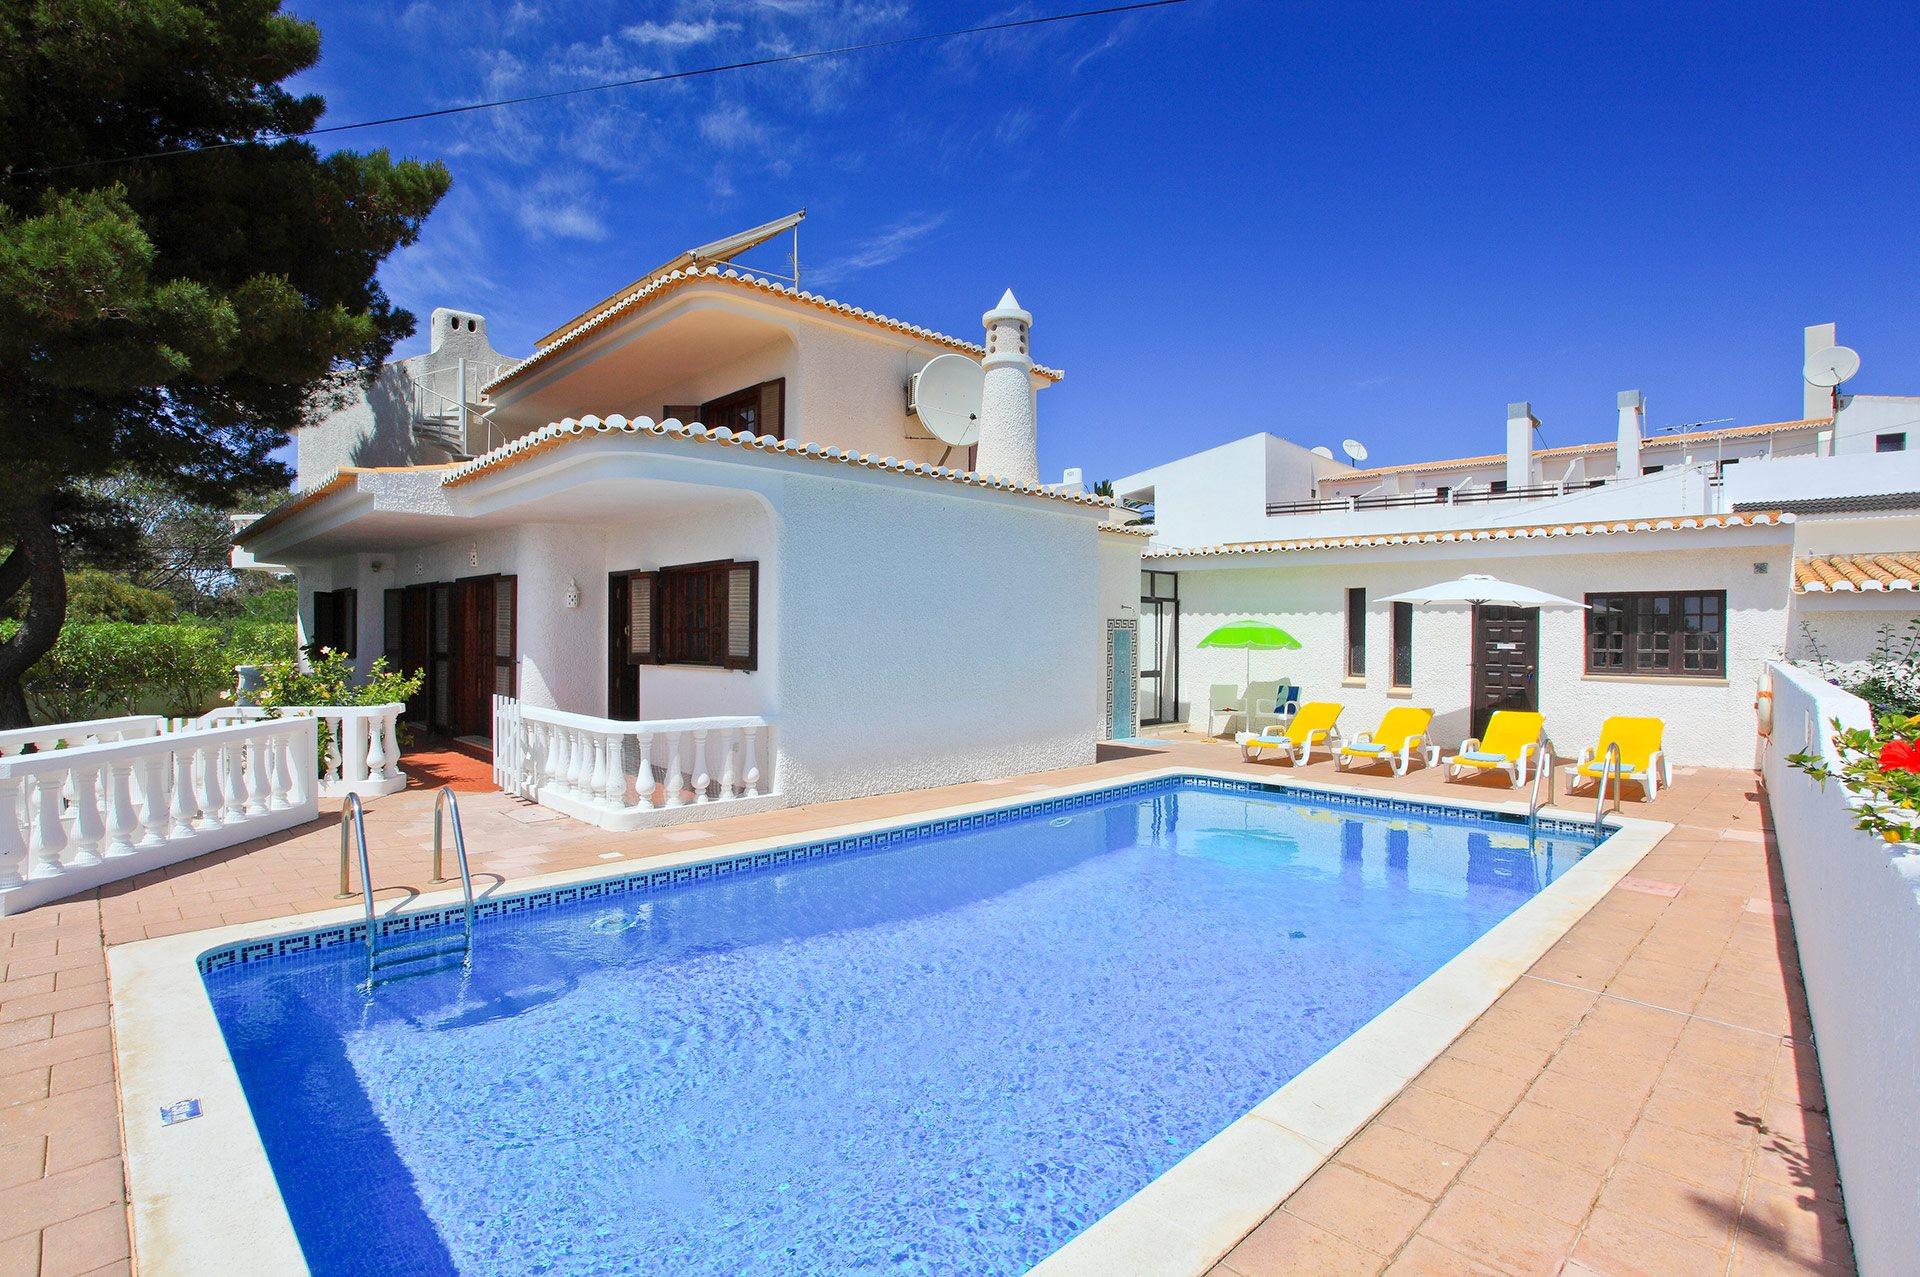 Villa Mabelle, Castelo, Algarve, Portugal